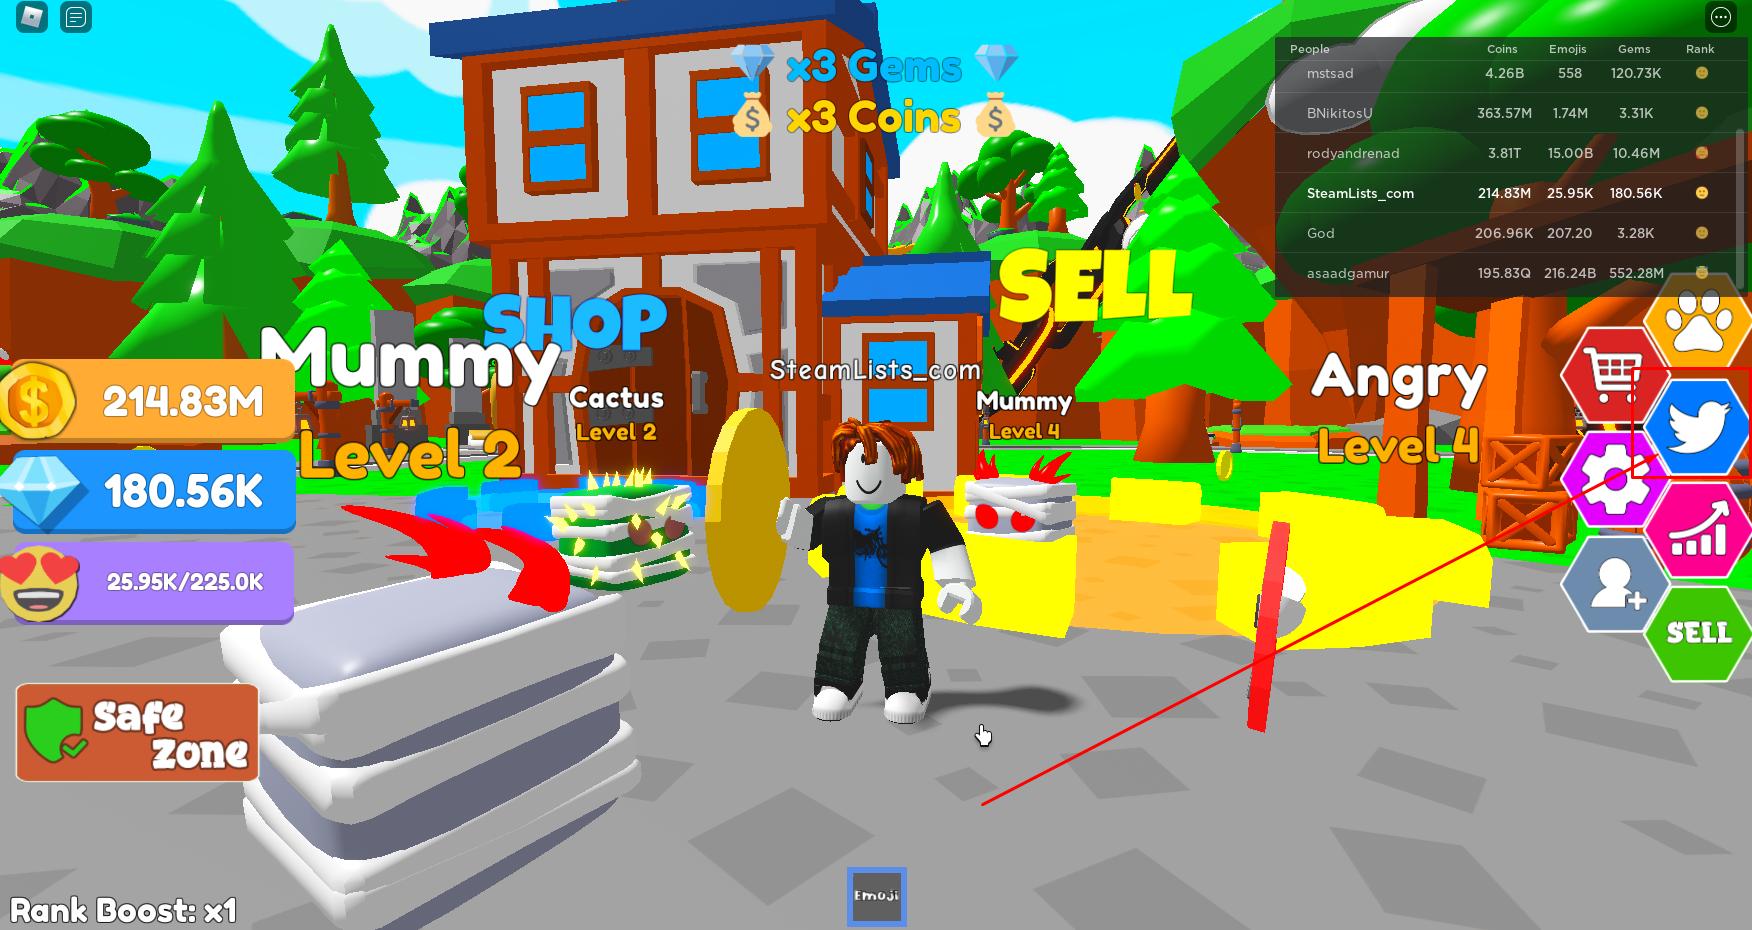 Roblox Happy Simulator 2 Codes